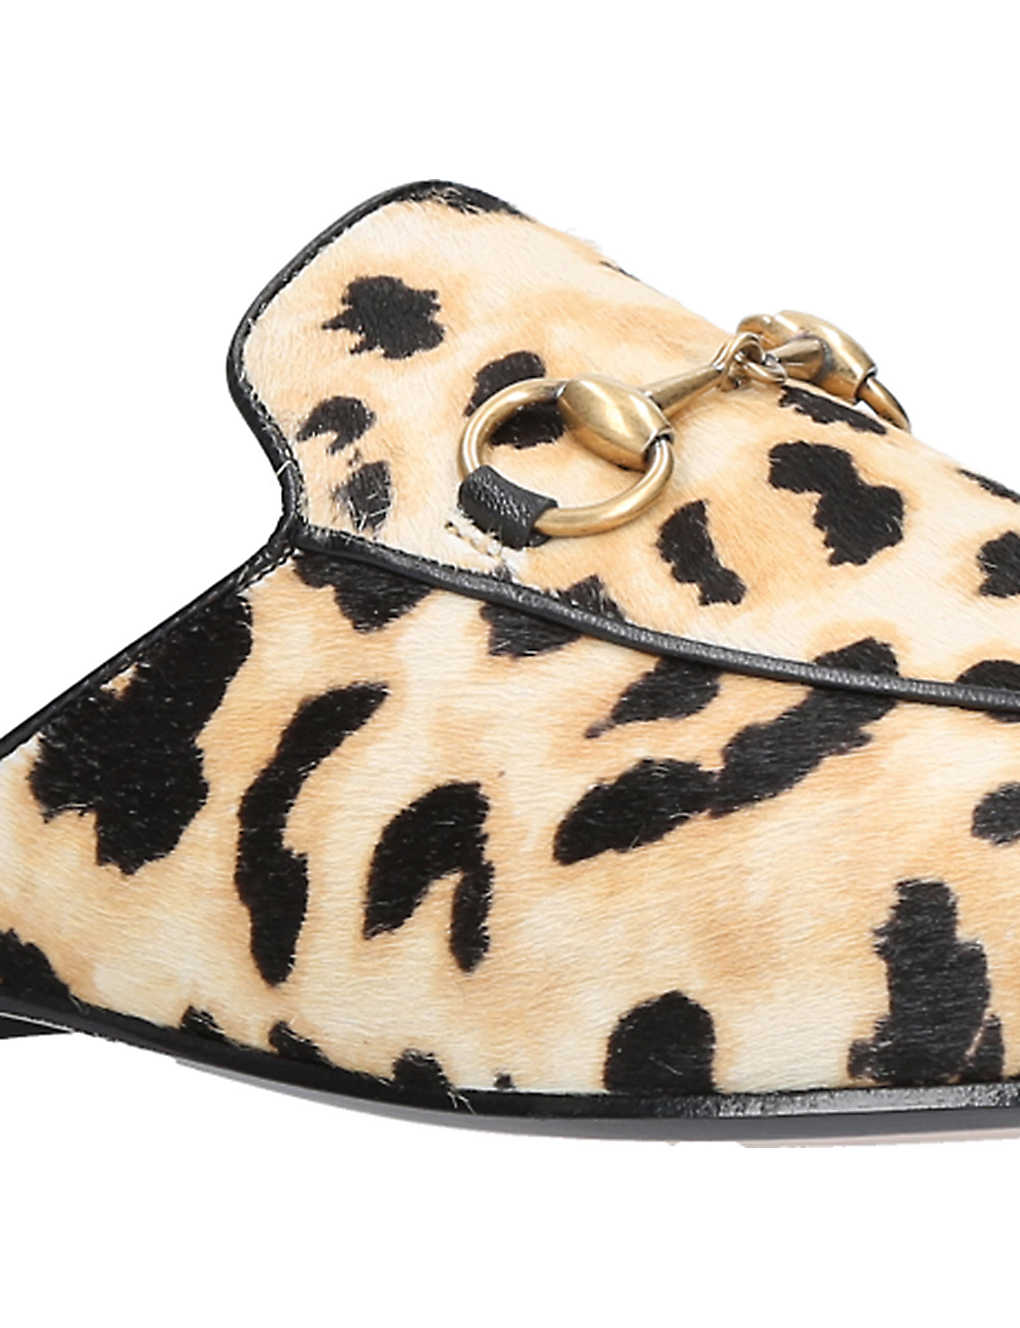 a1d83ab20694 GUCCI - Princetown leopard calf-hair slippers | Selfridges.com